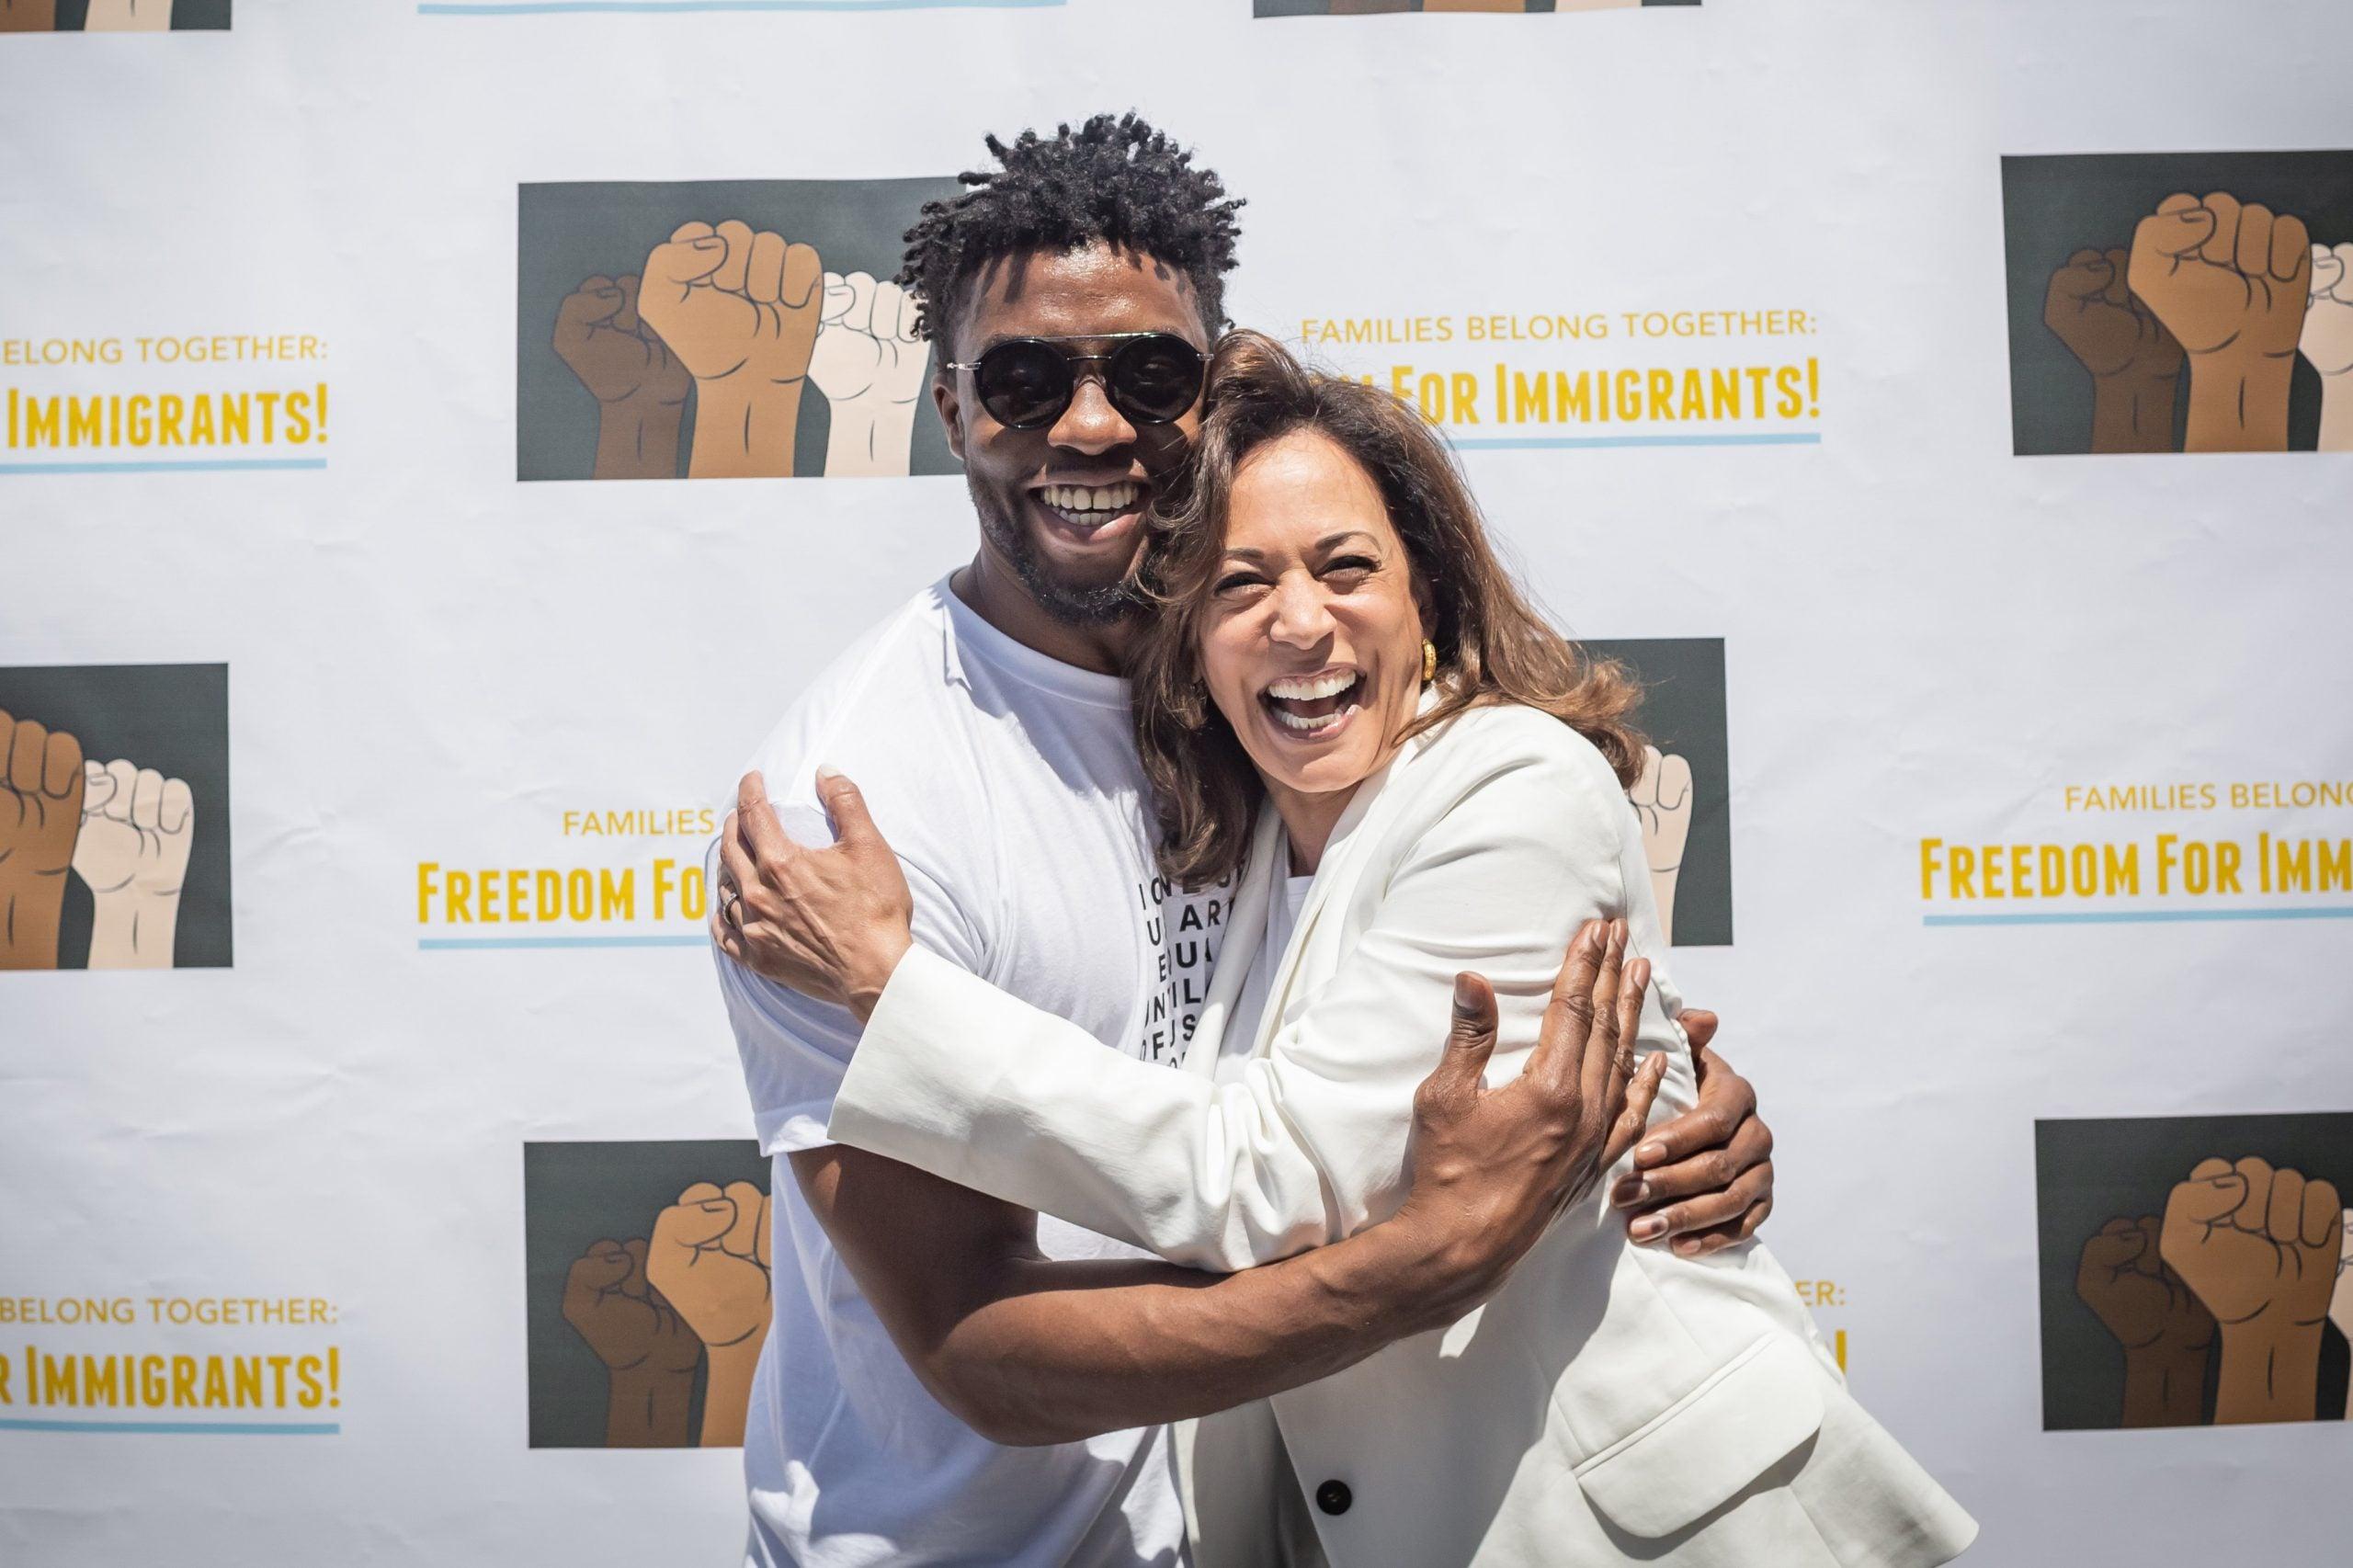 Chadwick Boseman embraces Sen. Kamala Harris